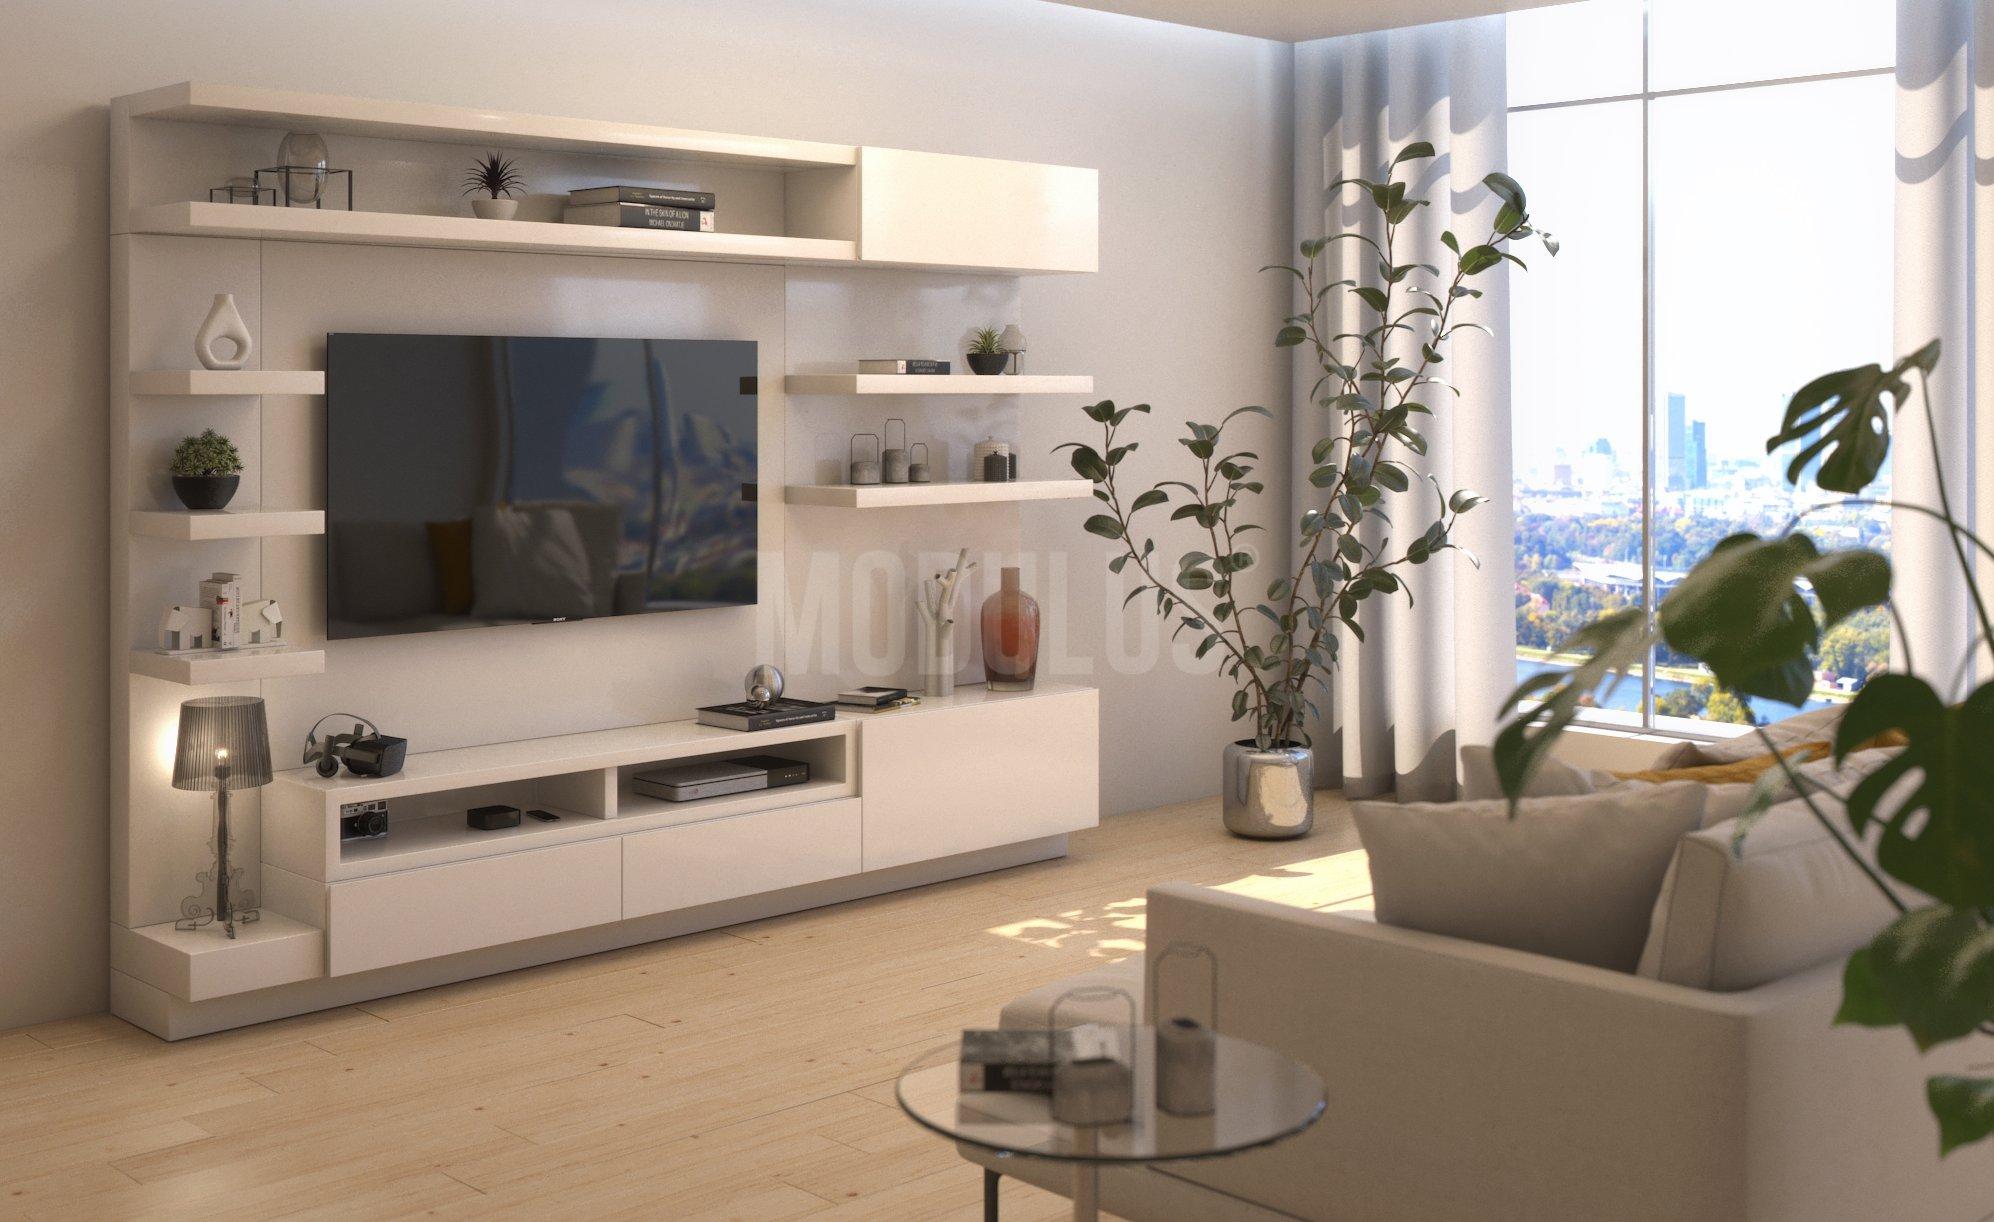 modulus muebles de dise o contemporaneo wall unit living On diseno de muebles para living comedor